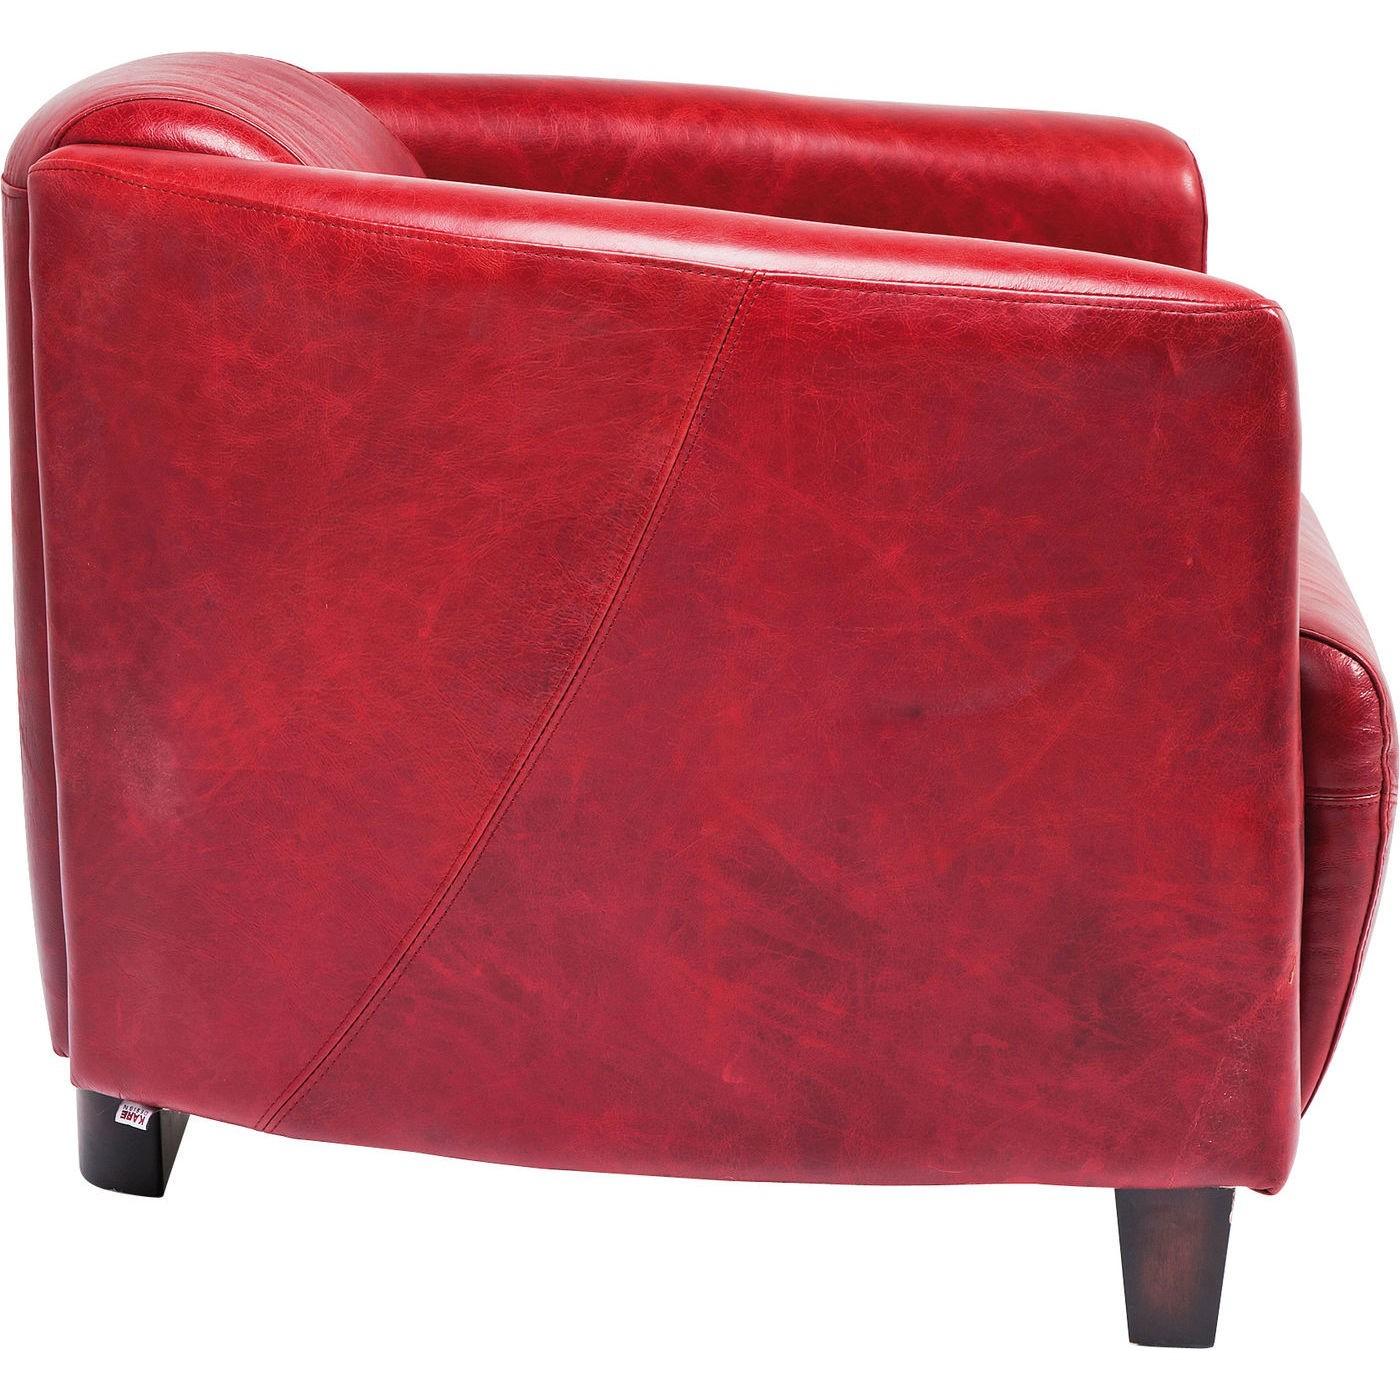 Fauteuil Cigar Lounge cuir rouge Kare Design